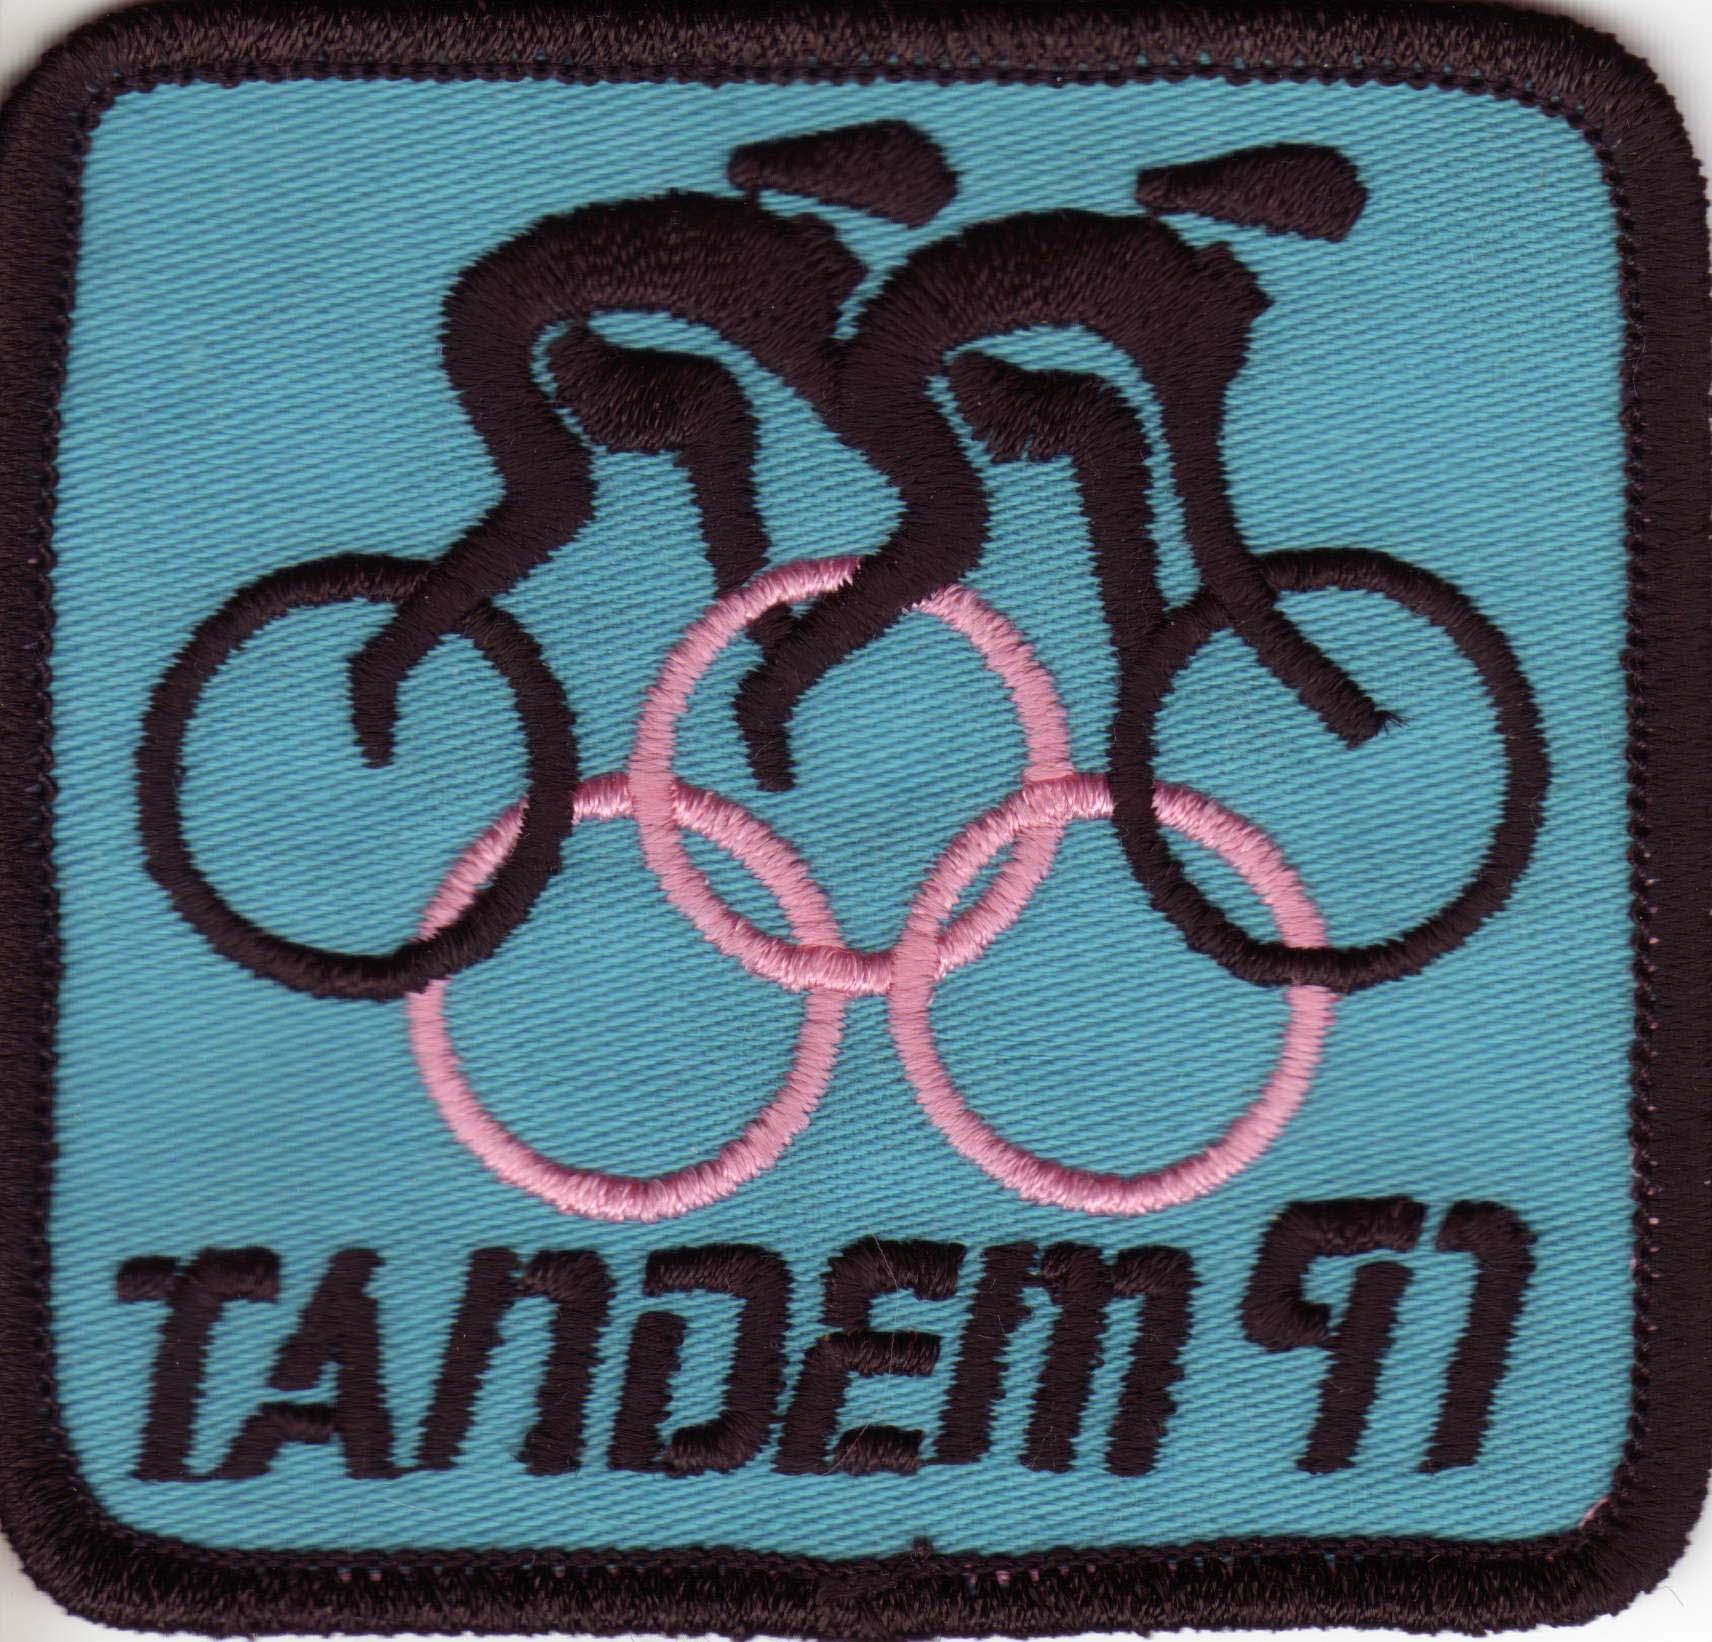 ETR 1991 Allentown PA